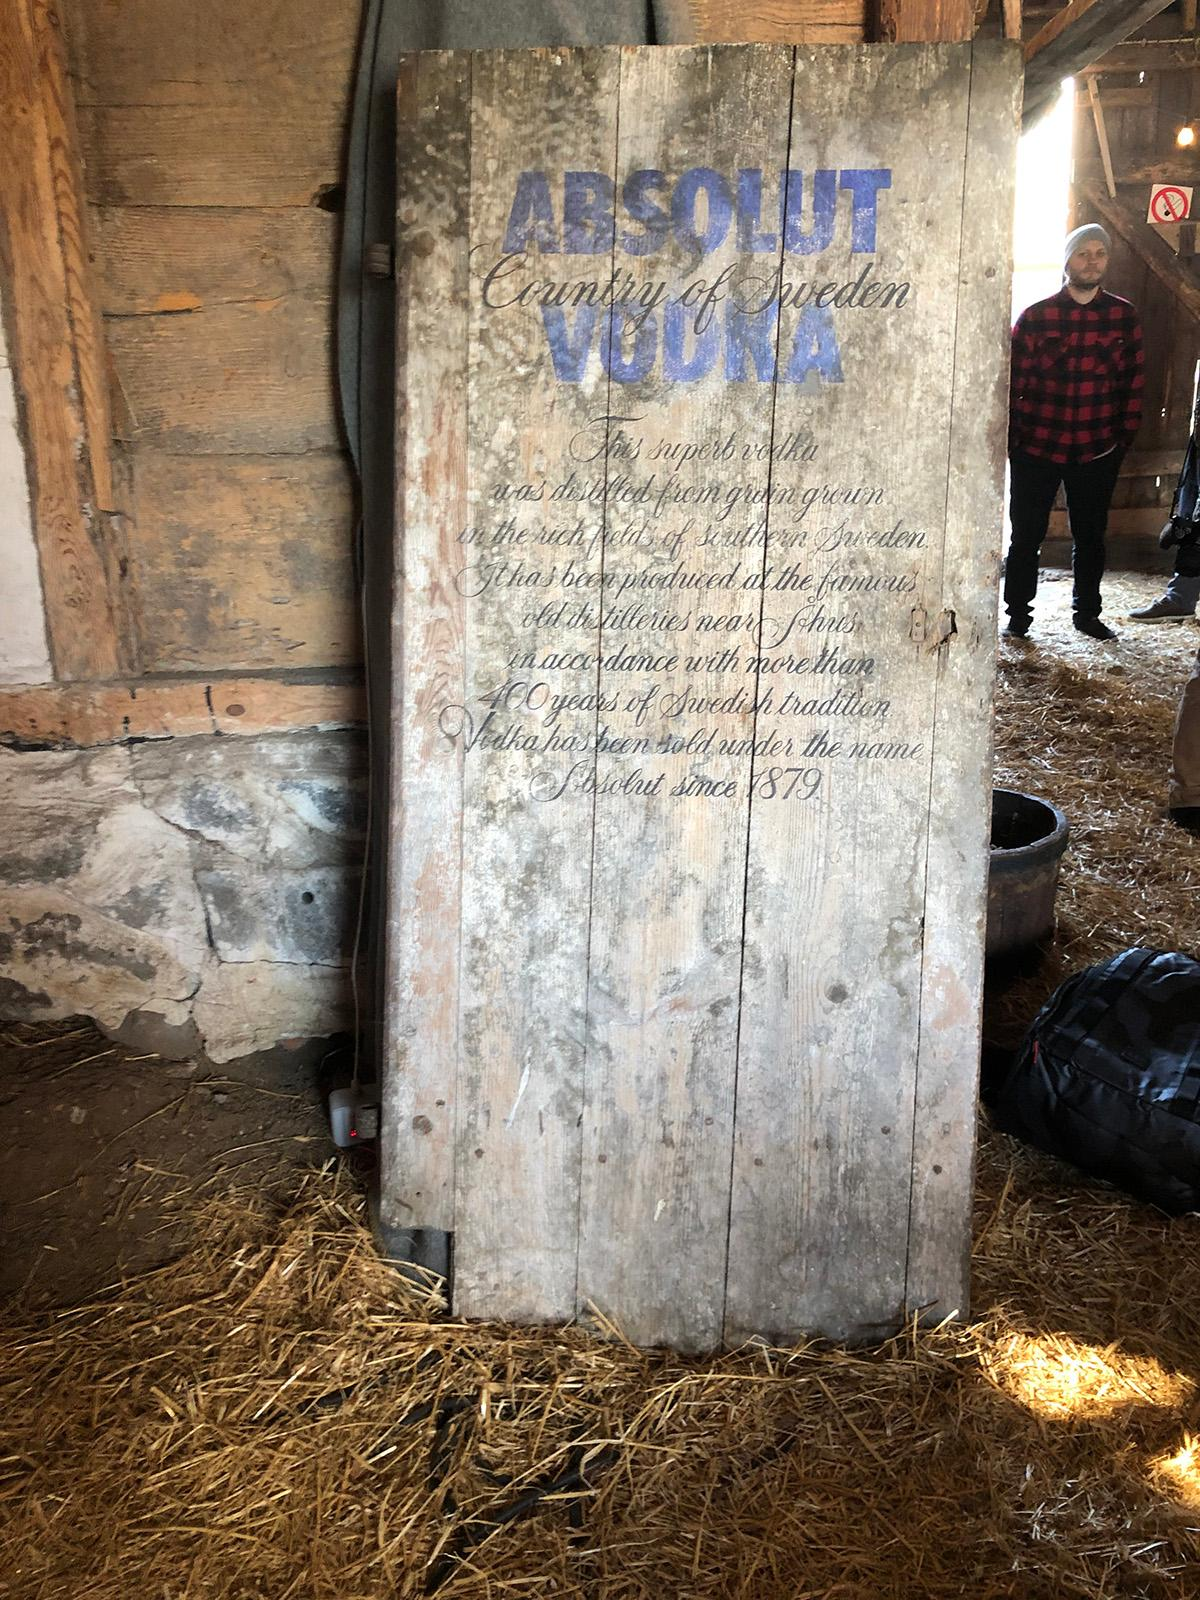 absolut-farmhouse-1562867632276.jpg